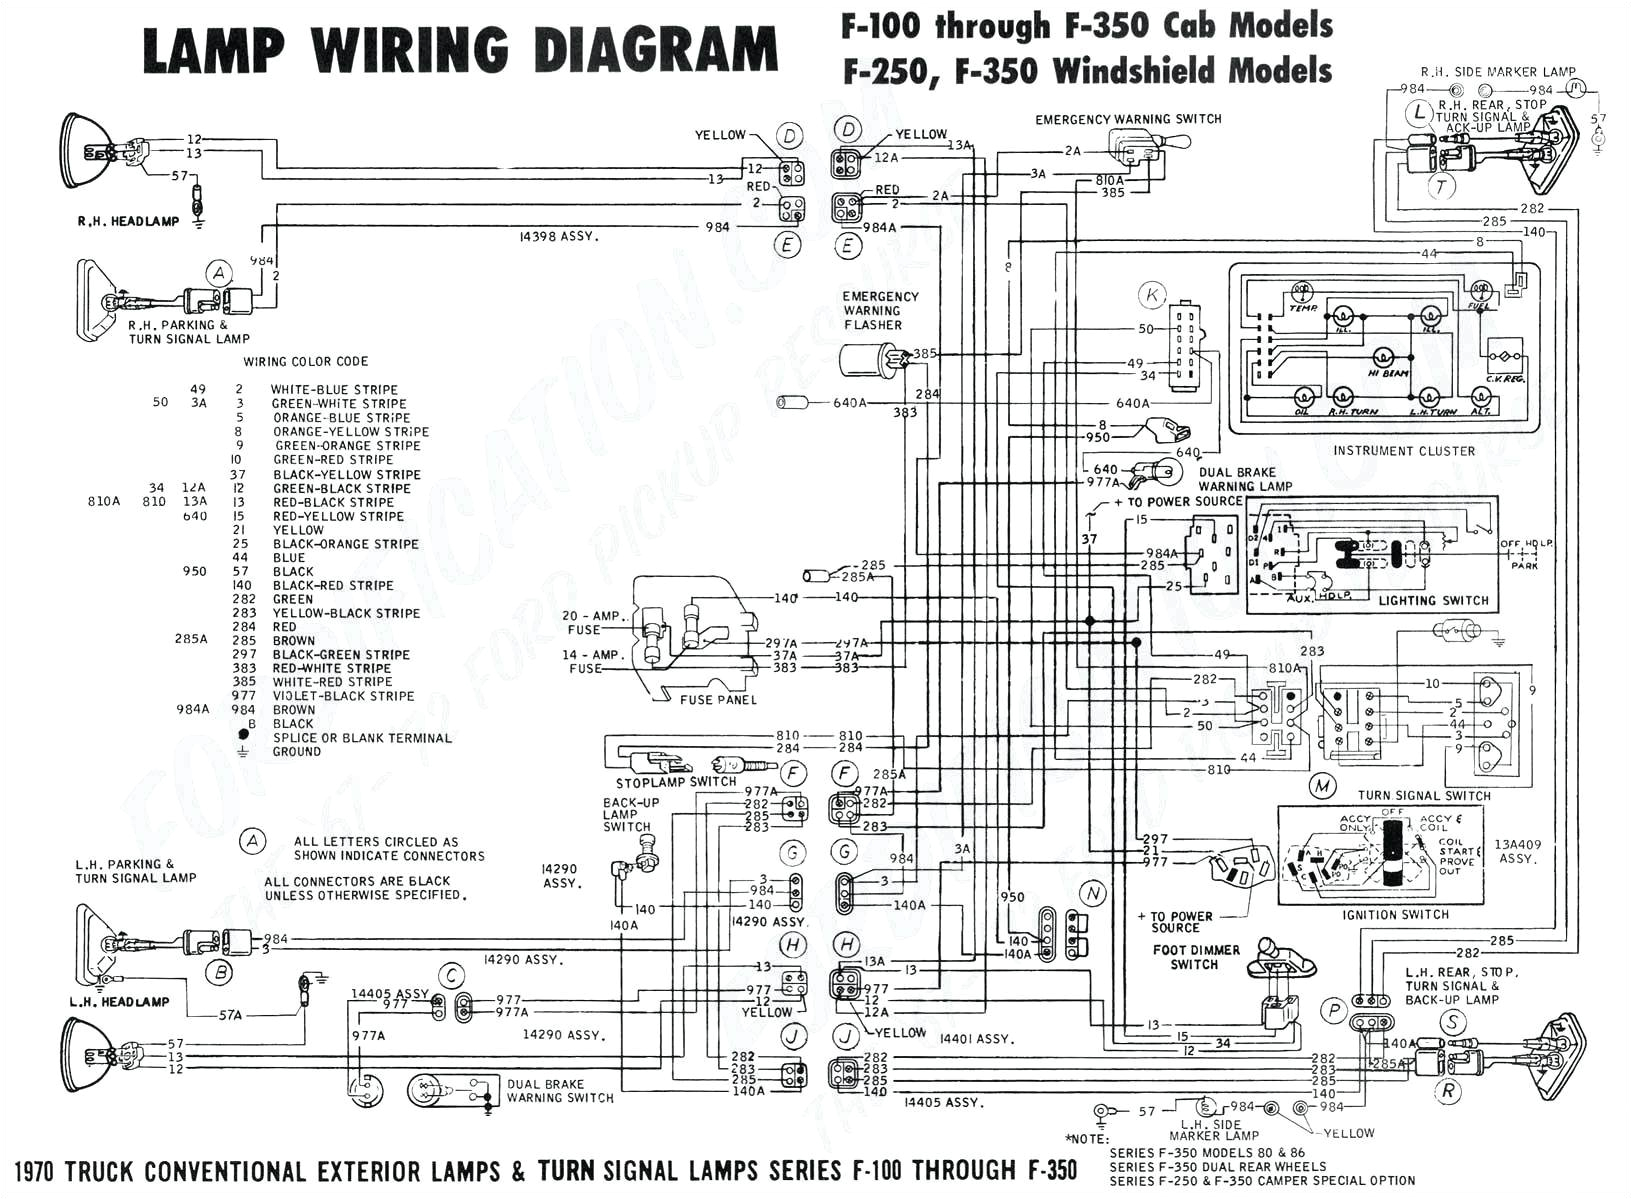 2004 Mustang Fuel Pump Wiring Diagram Diagram Moreover Diagram Of 1999 ford Mustang Fuel System Moreover